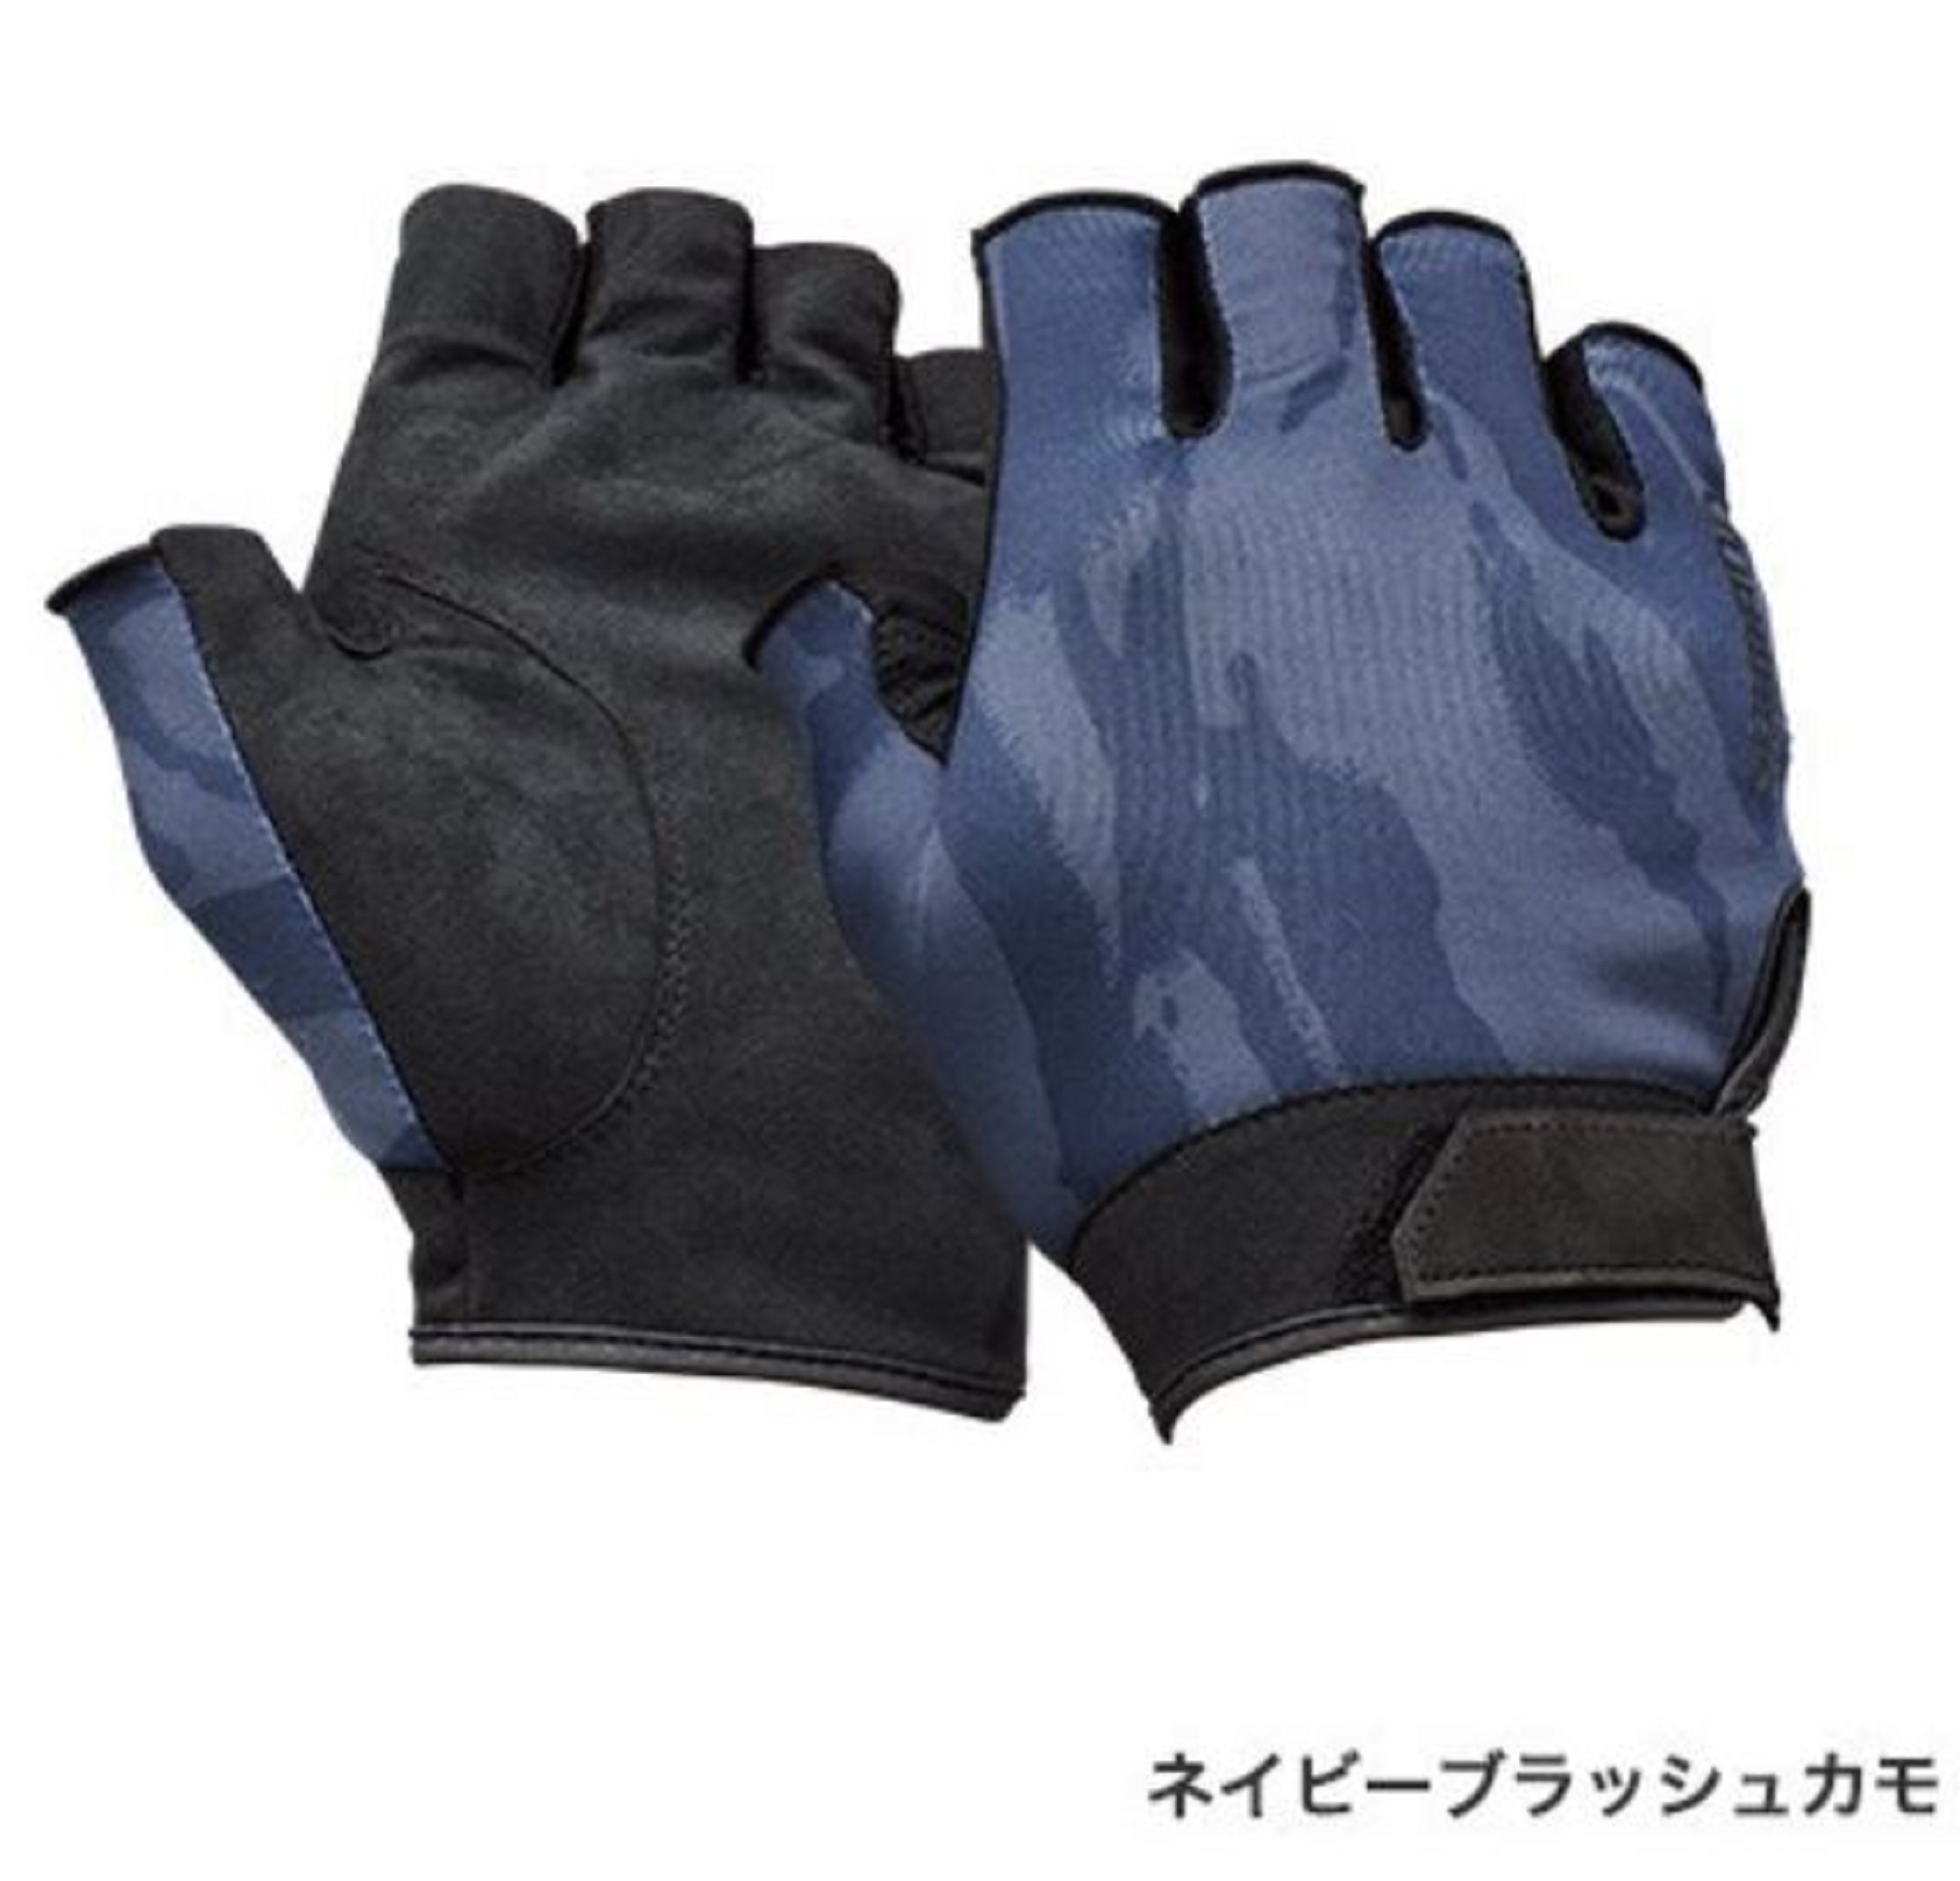 Shimano GL-012T Gloves Casting 5 Fingerless Navy Camo Size L 669391